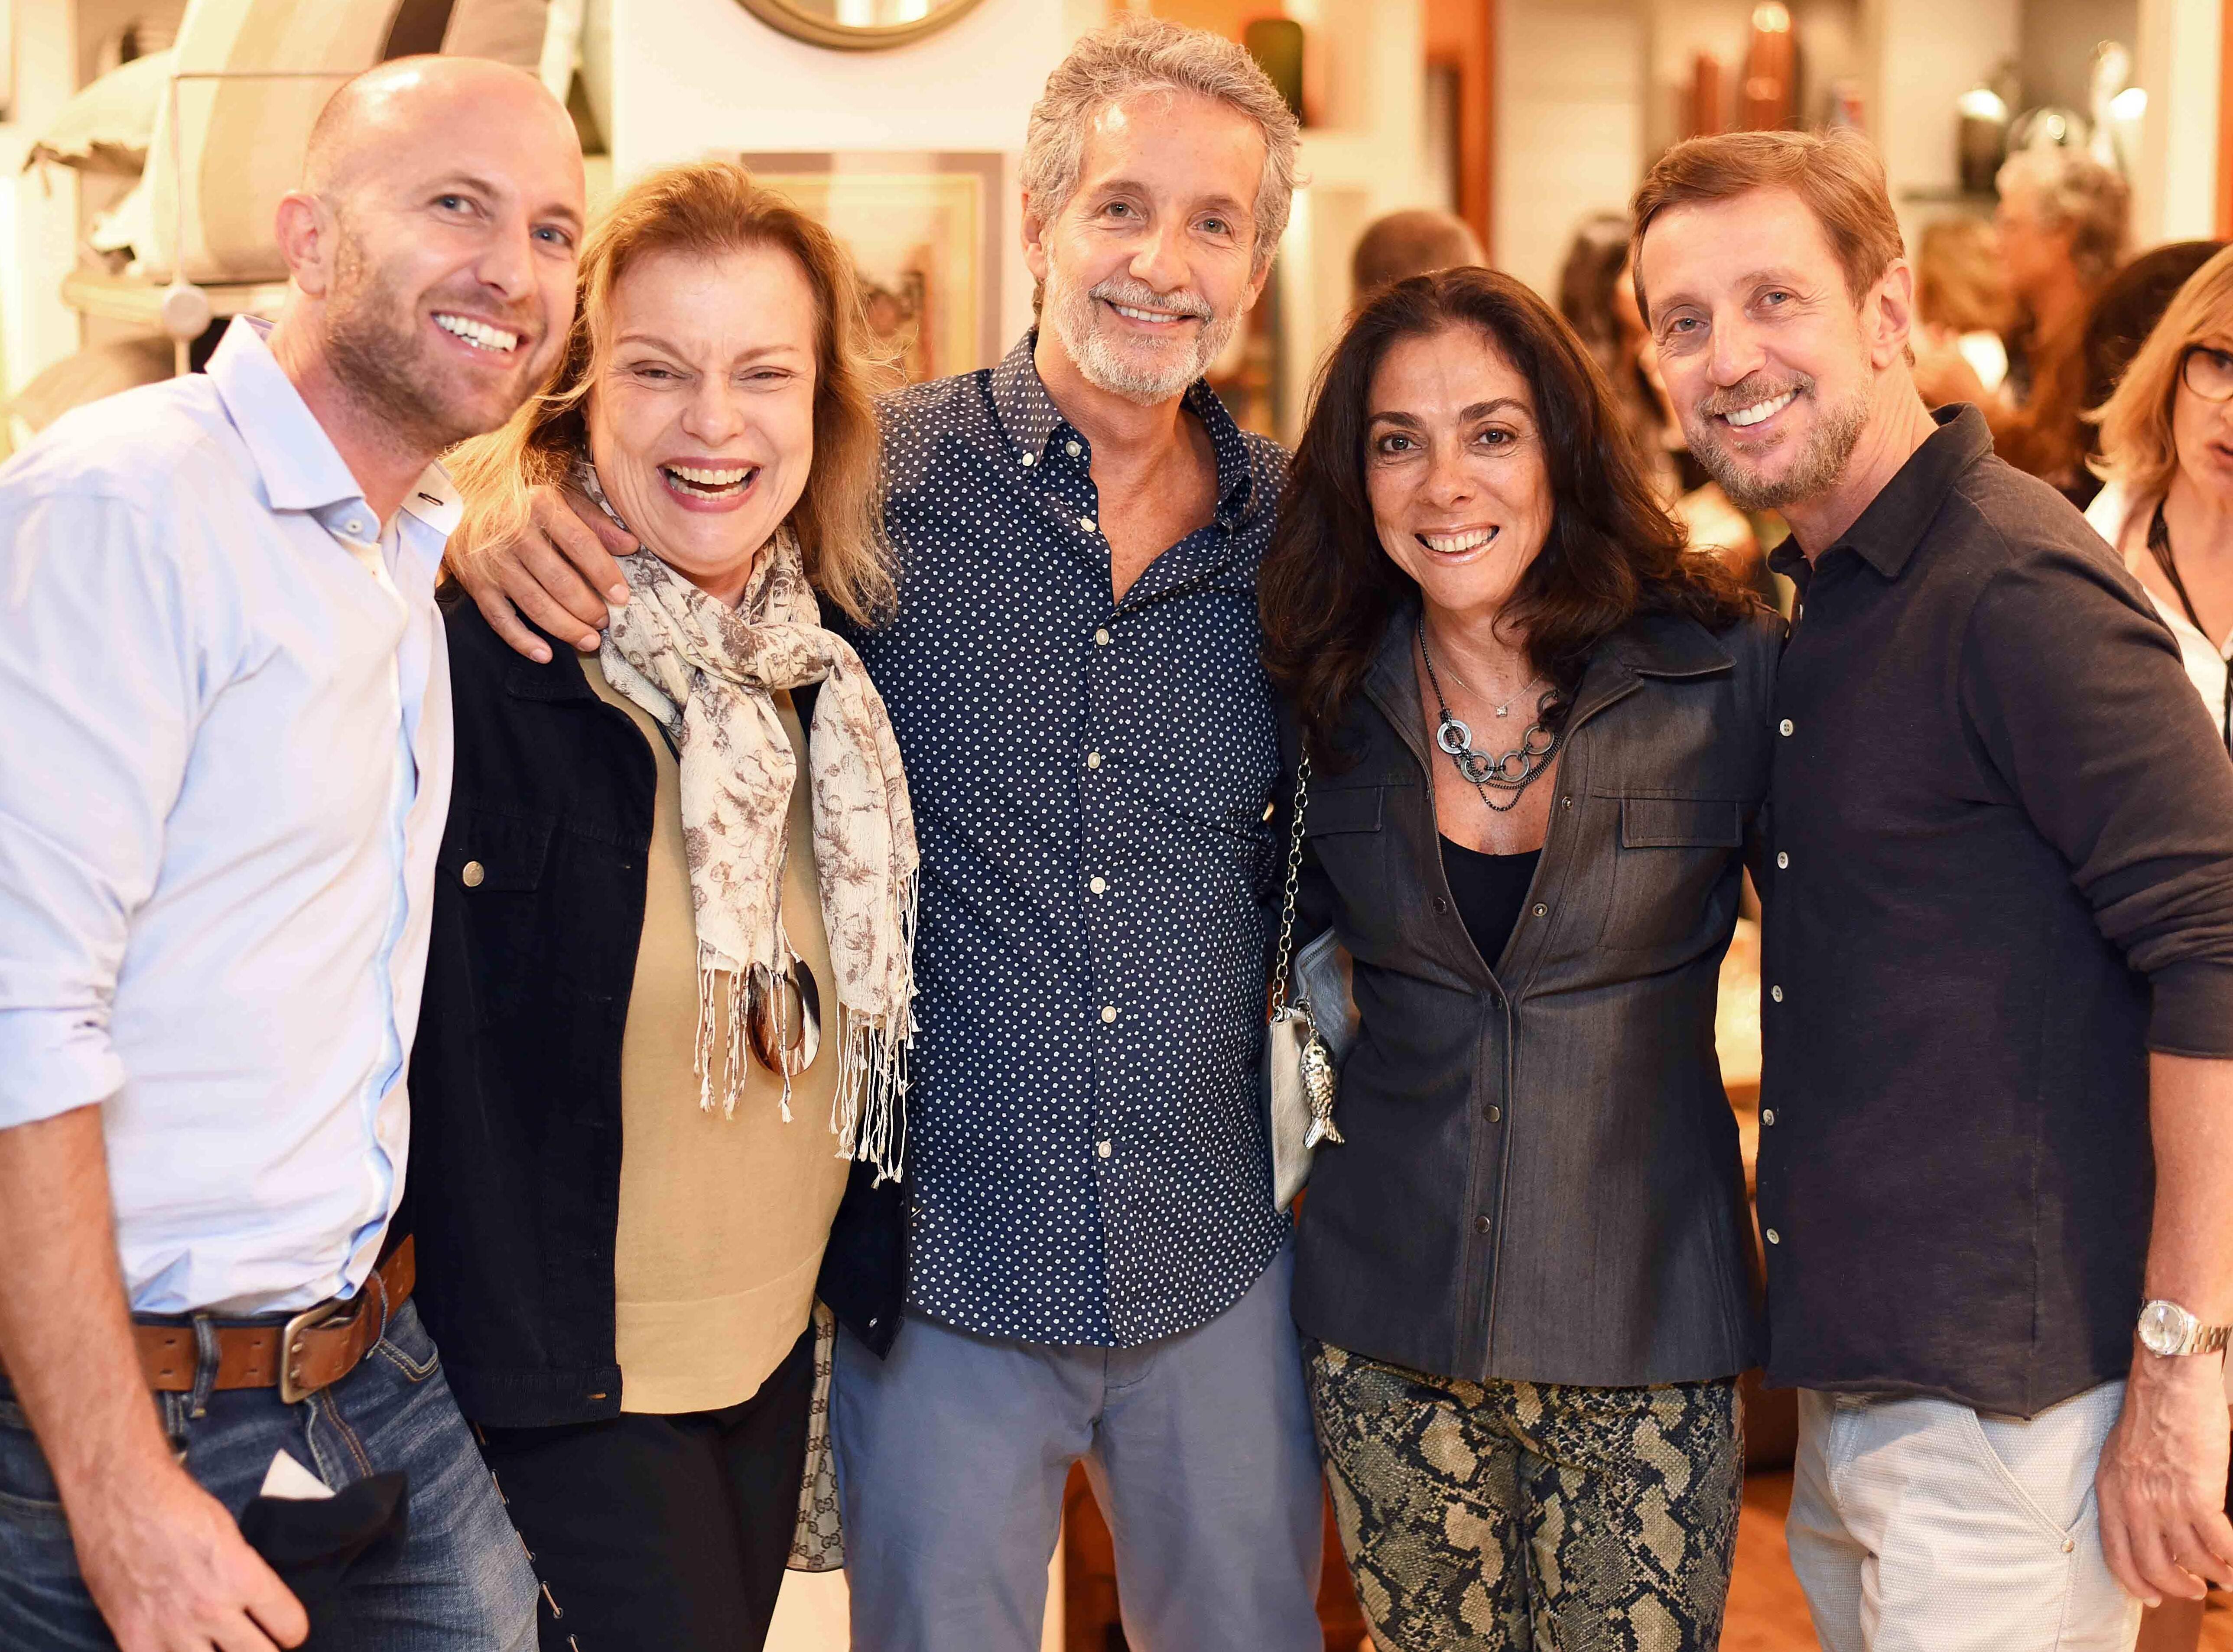 Stefan Ganglberger, Laura Burnier, Pedro Guimarães, Ana Luiza Rego e Nando Grabowsky /Foto: Ari Kaye